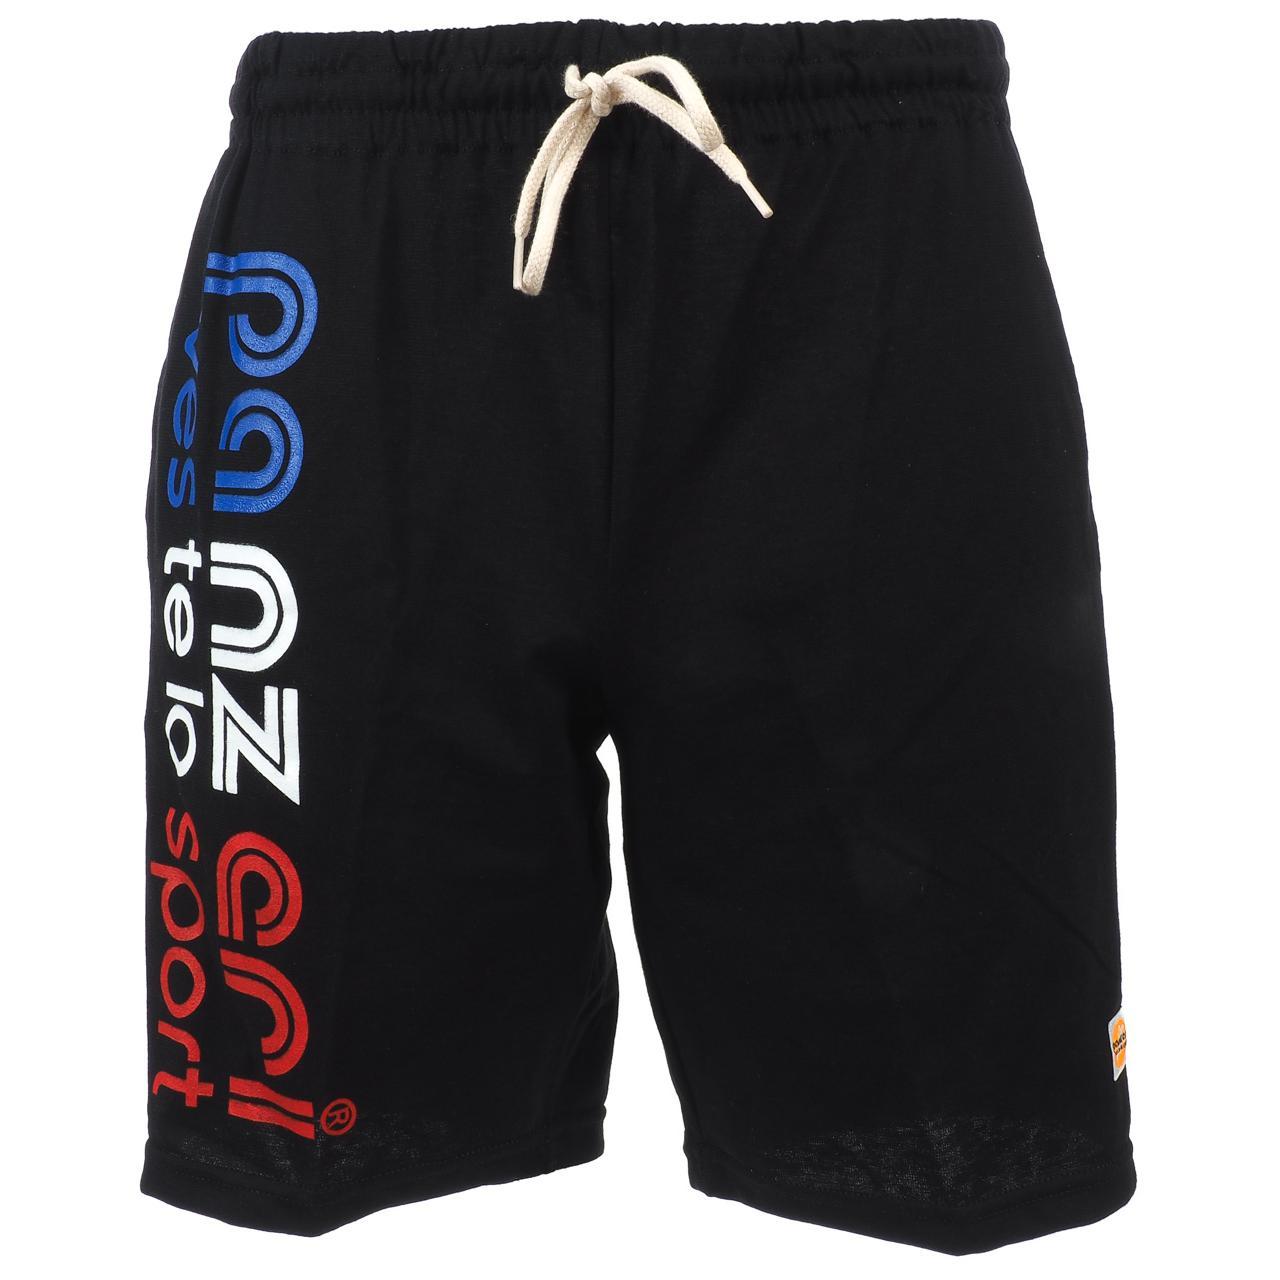 Shorts-Multi-Panzeri-Park-B-Nr-B-B-R-Bermuda-Black-22071-New